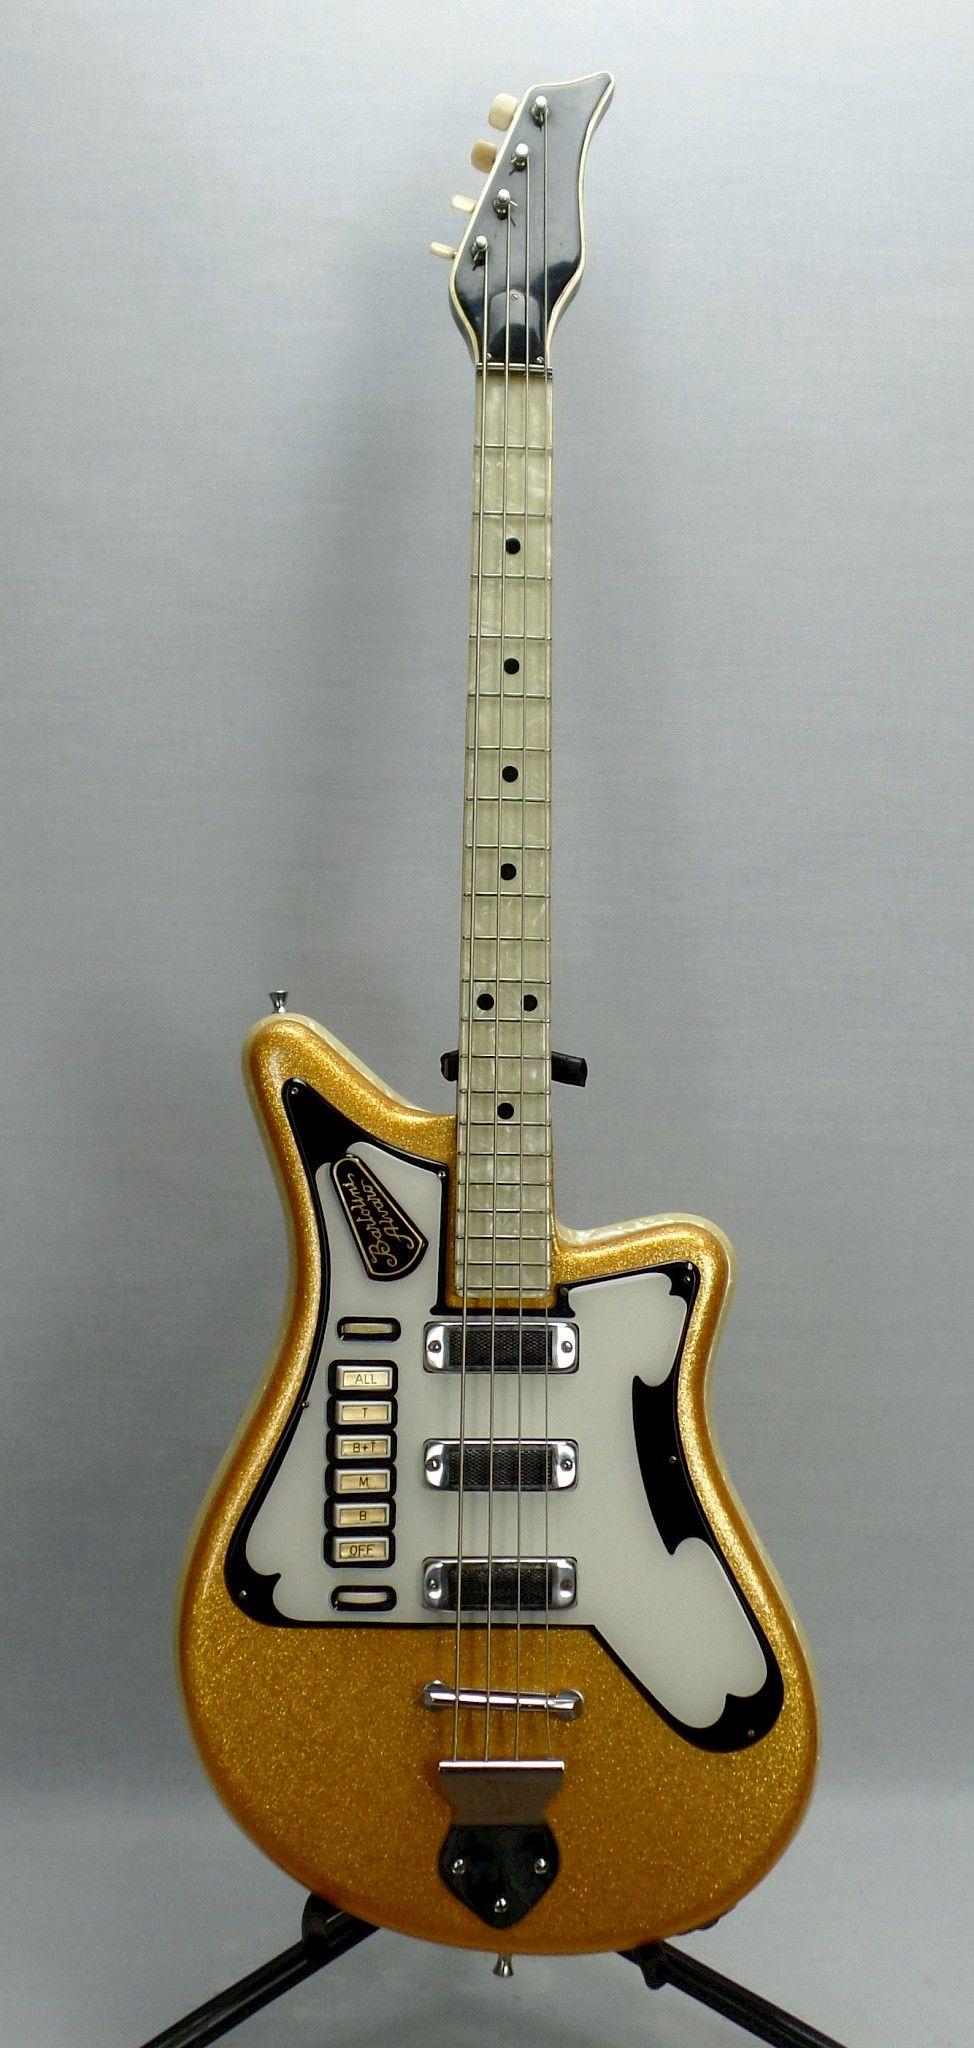 Alvaro Bartolini Guitarage Nl Guitar Crazy Crazy Guitars In 2020 Vintage Electric Guitars Guitar Cool Guitar